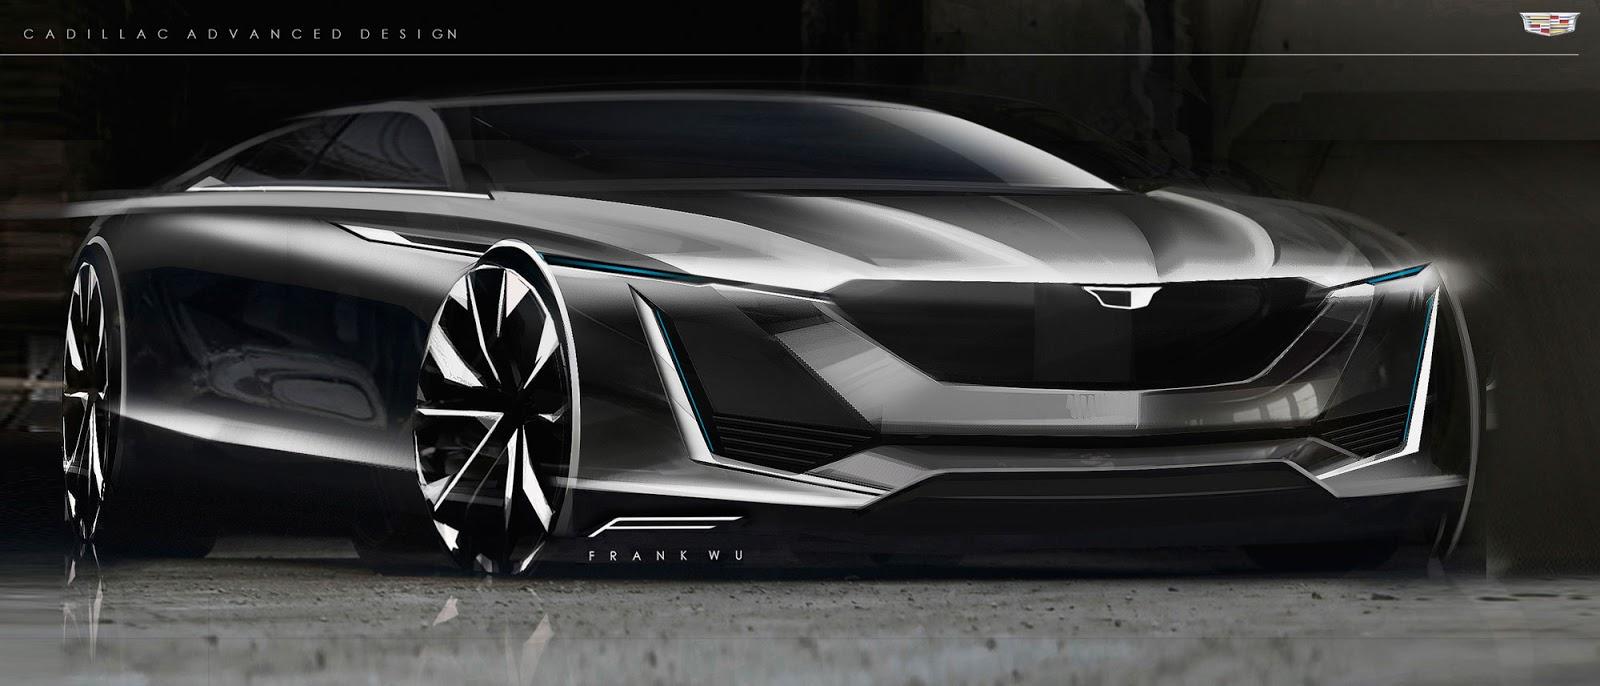 Cadillac Escala concept sketch by Frank Wu